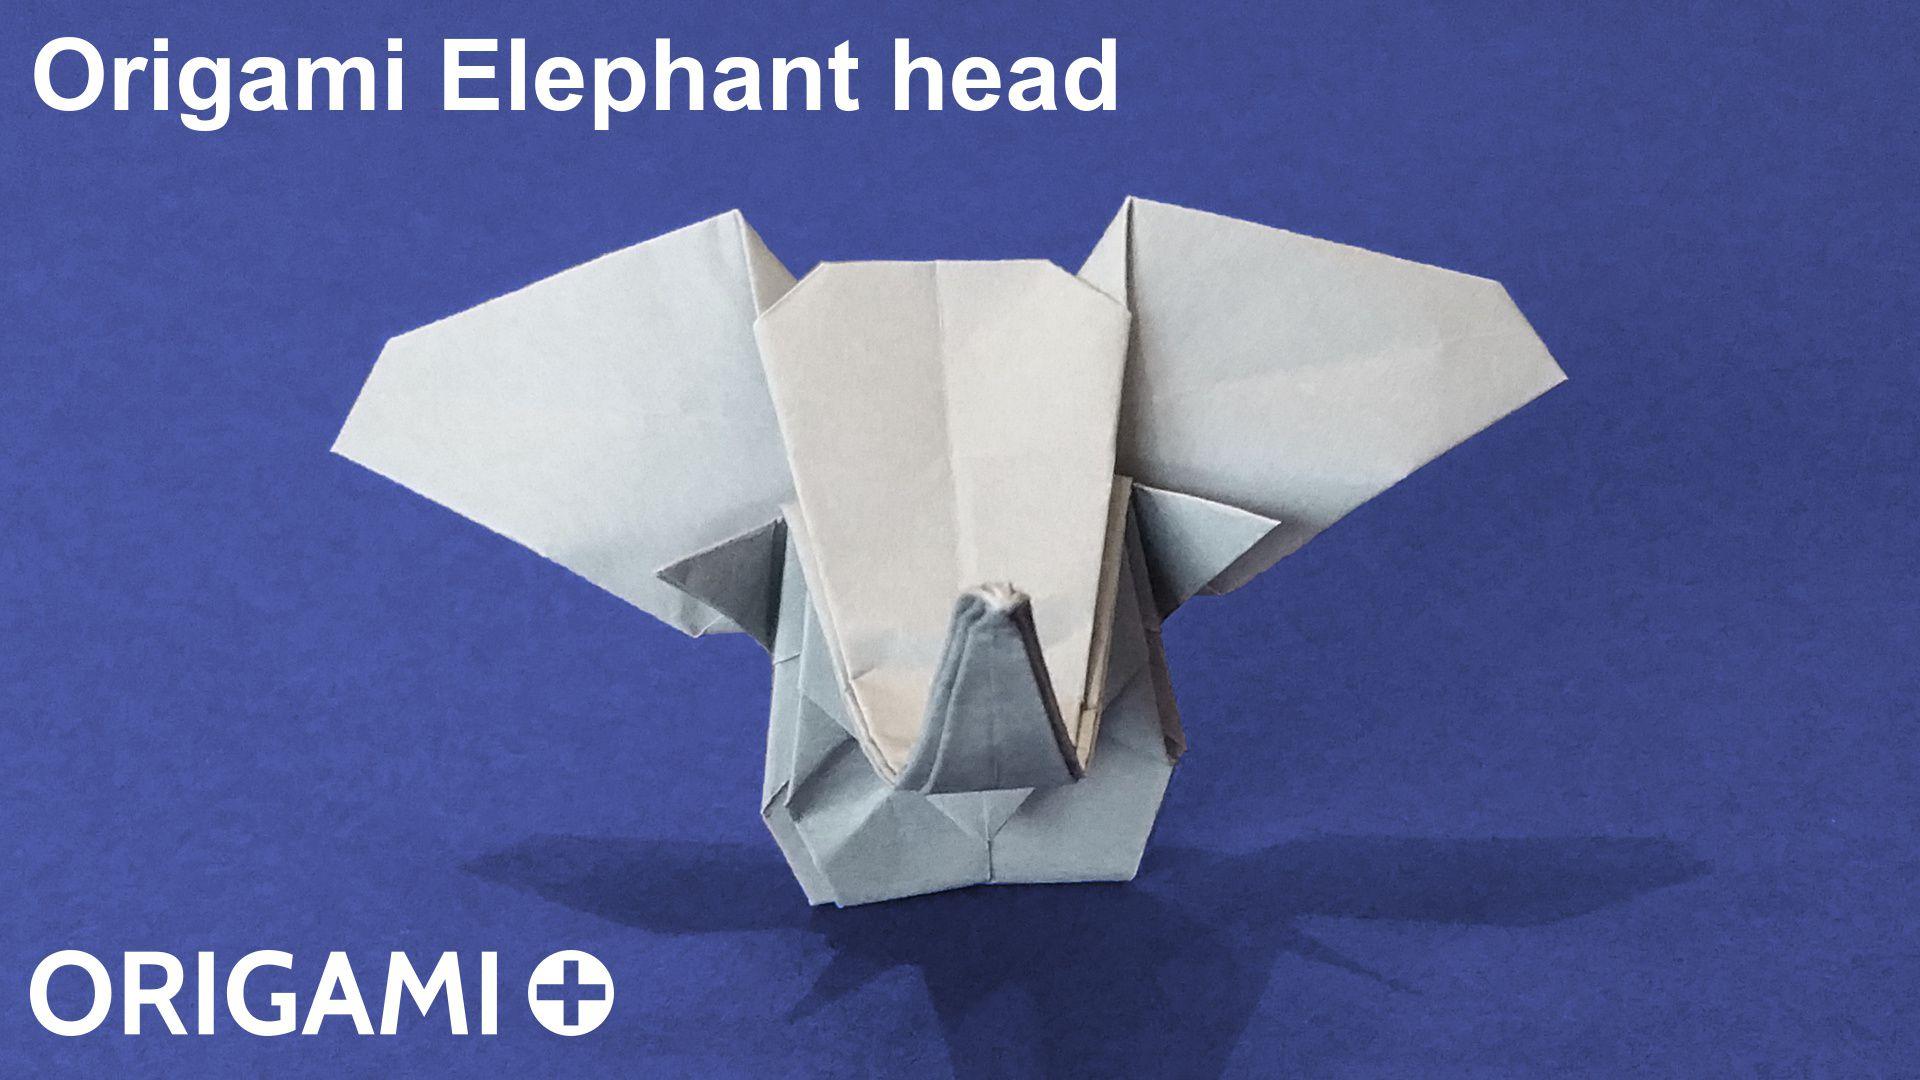 How To Make An Origami Elephant - YouTube | 1080x1920